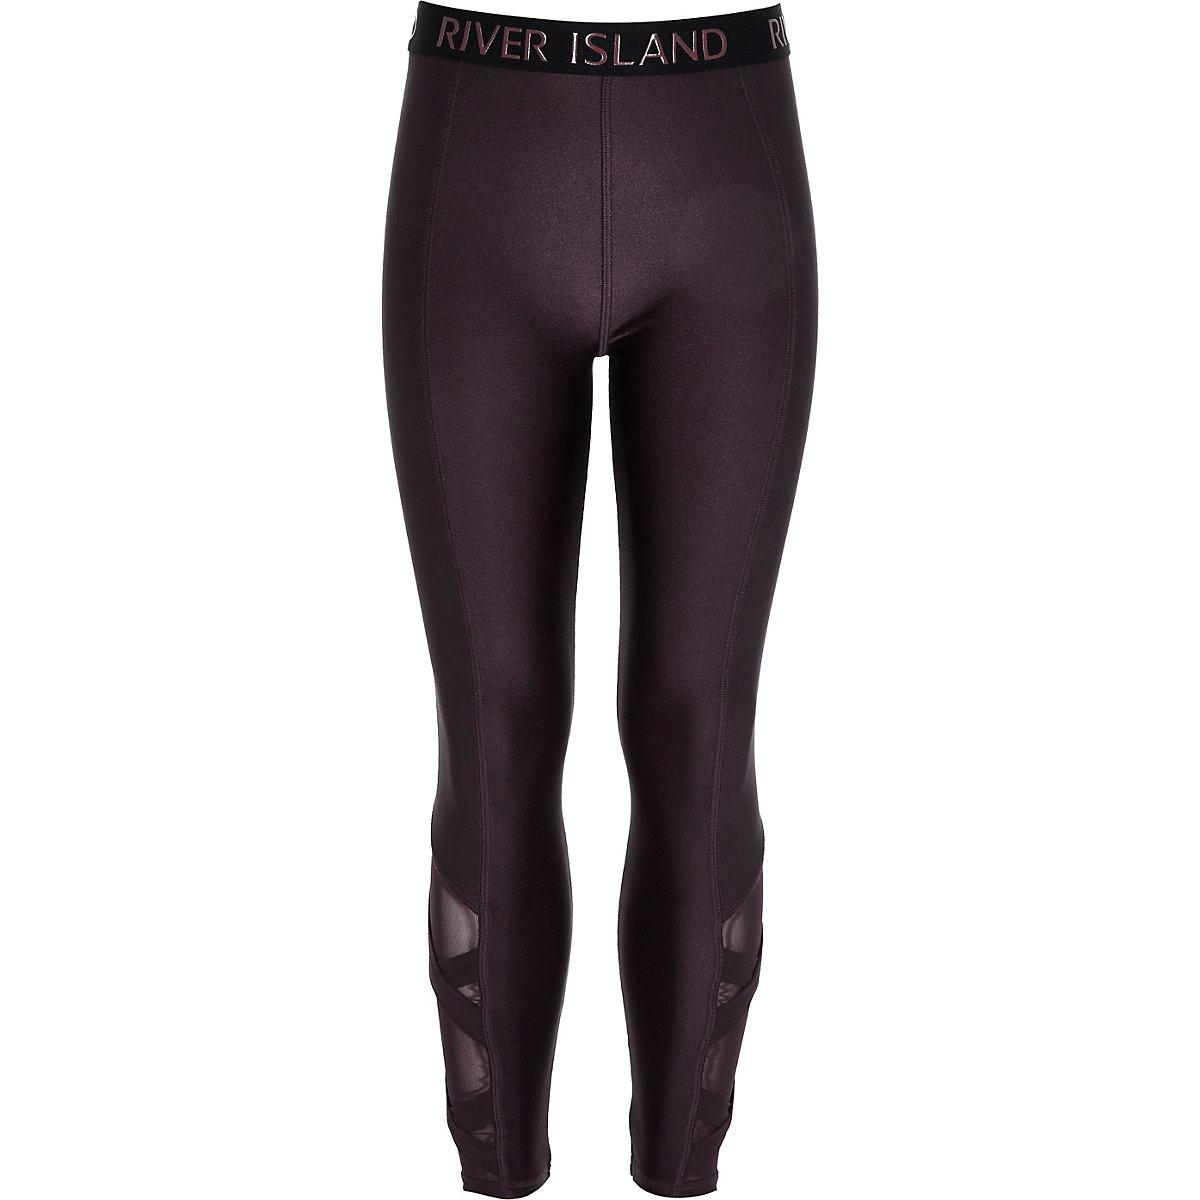 Girls RI Active purple cross leggings